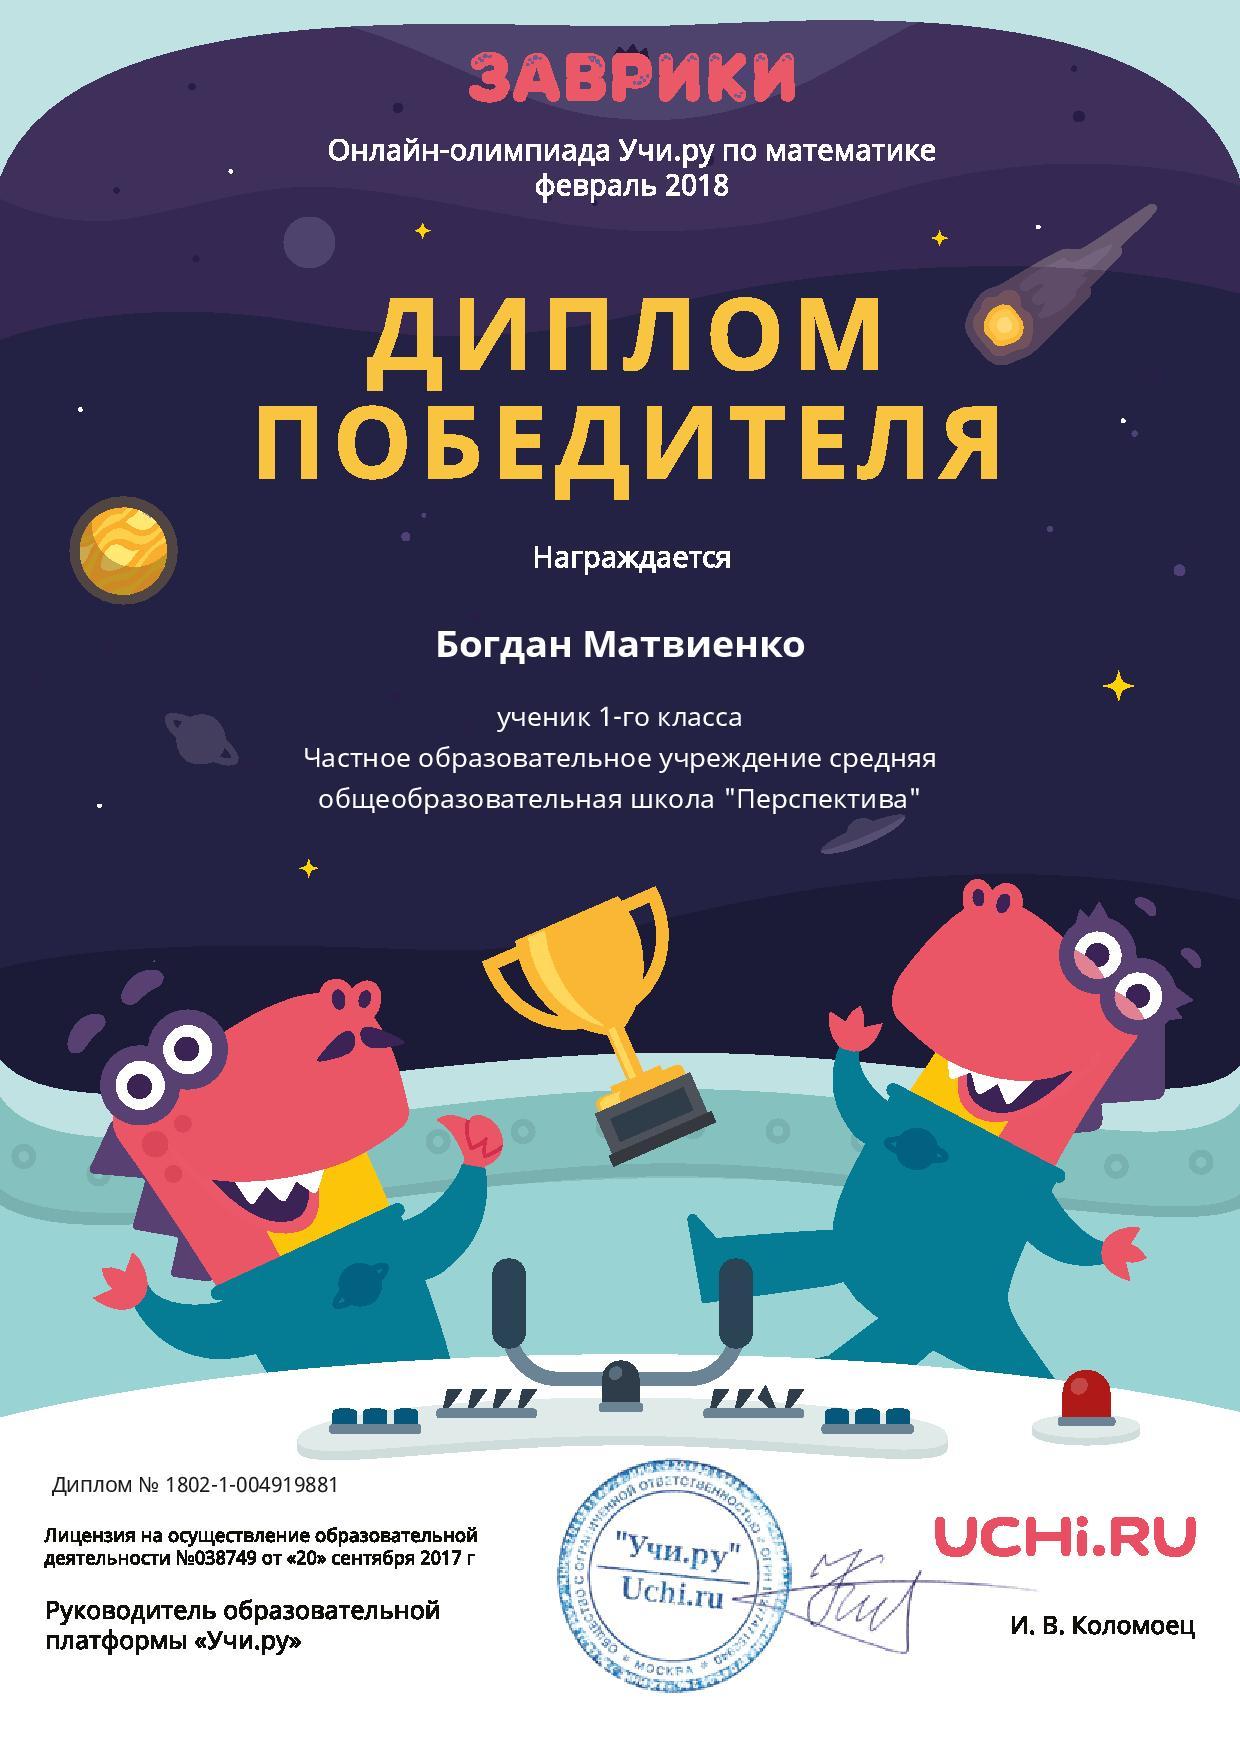 Diplom_Bogdan_Matvienko_4835363-page-001